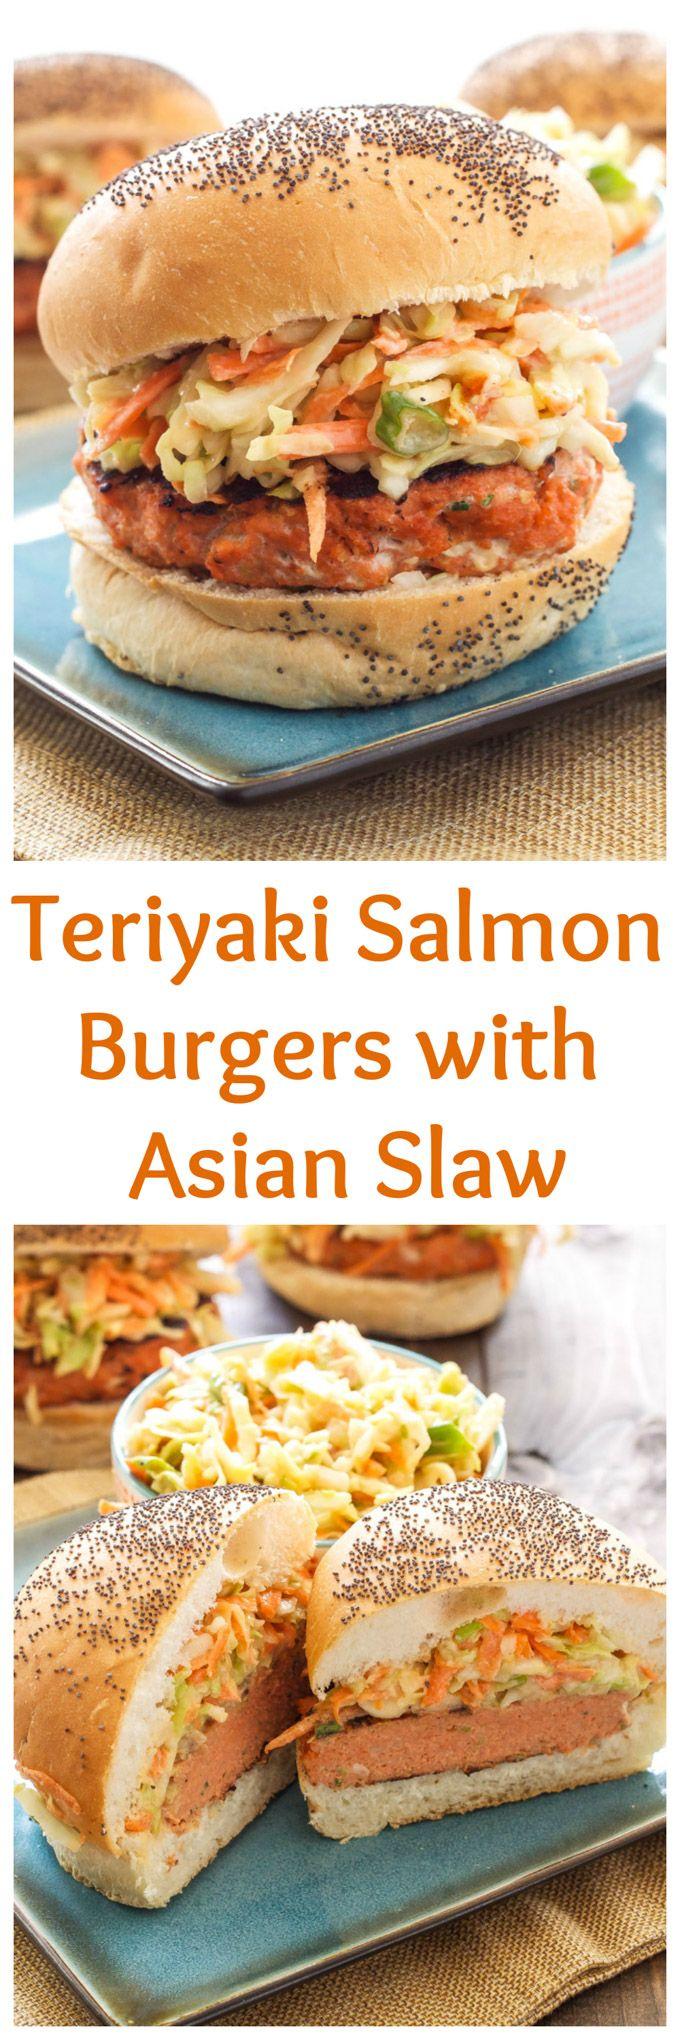 Teriyaki Salmon Burgers with Asian Slaw - Recipe Runner